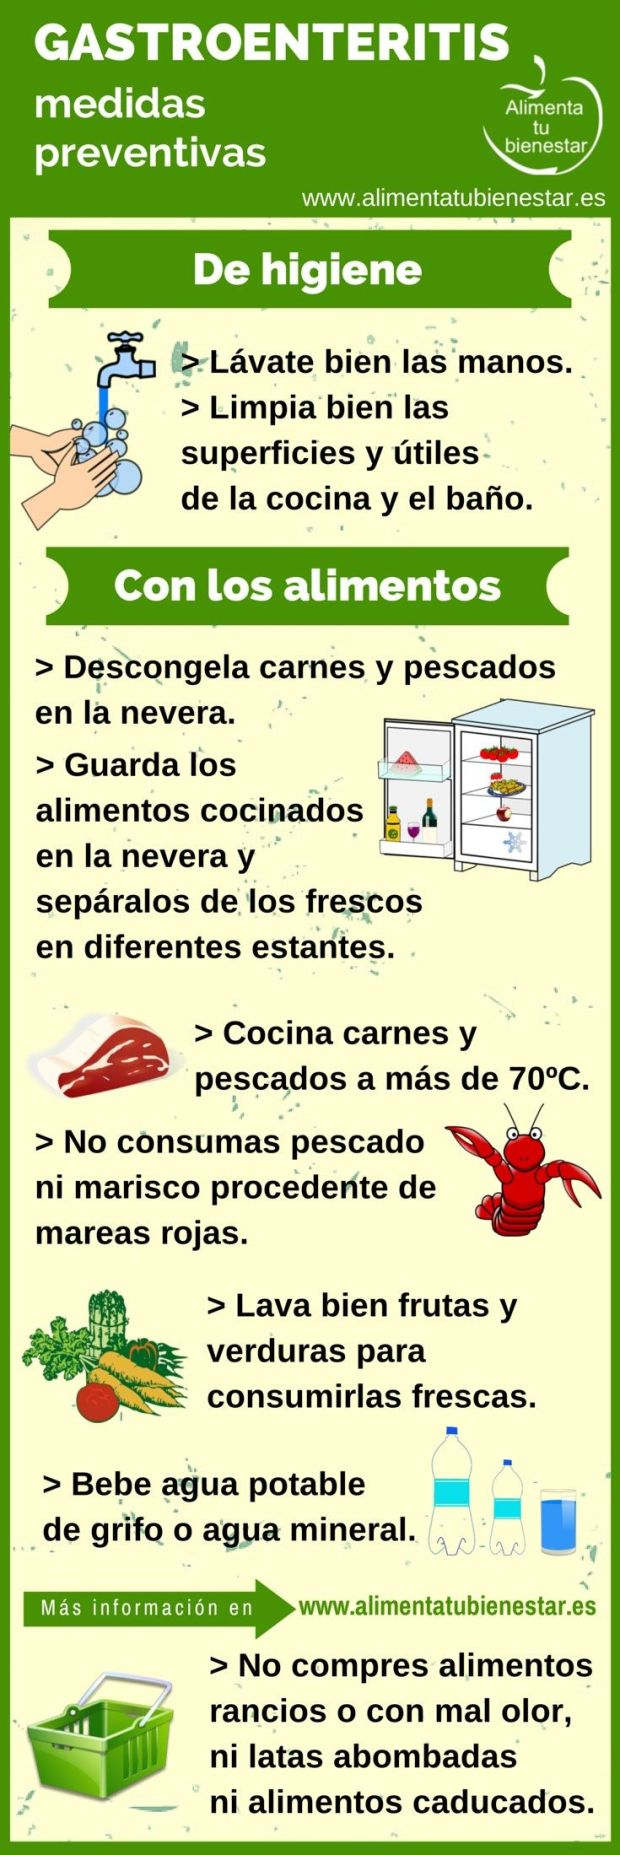 Gastroenteritis: medidas preventivas